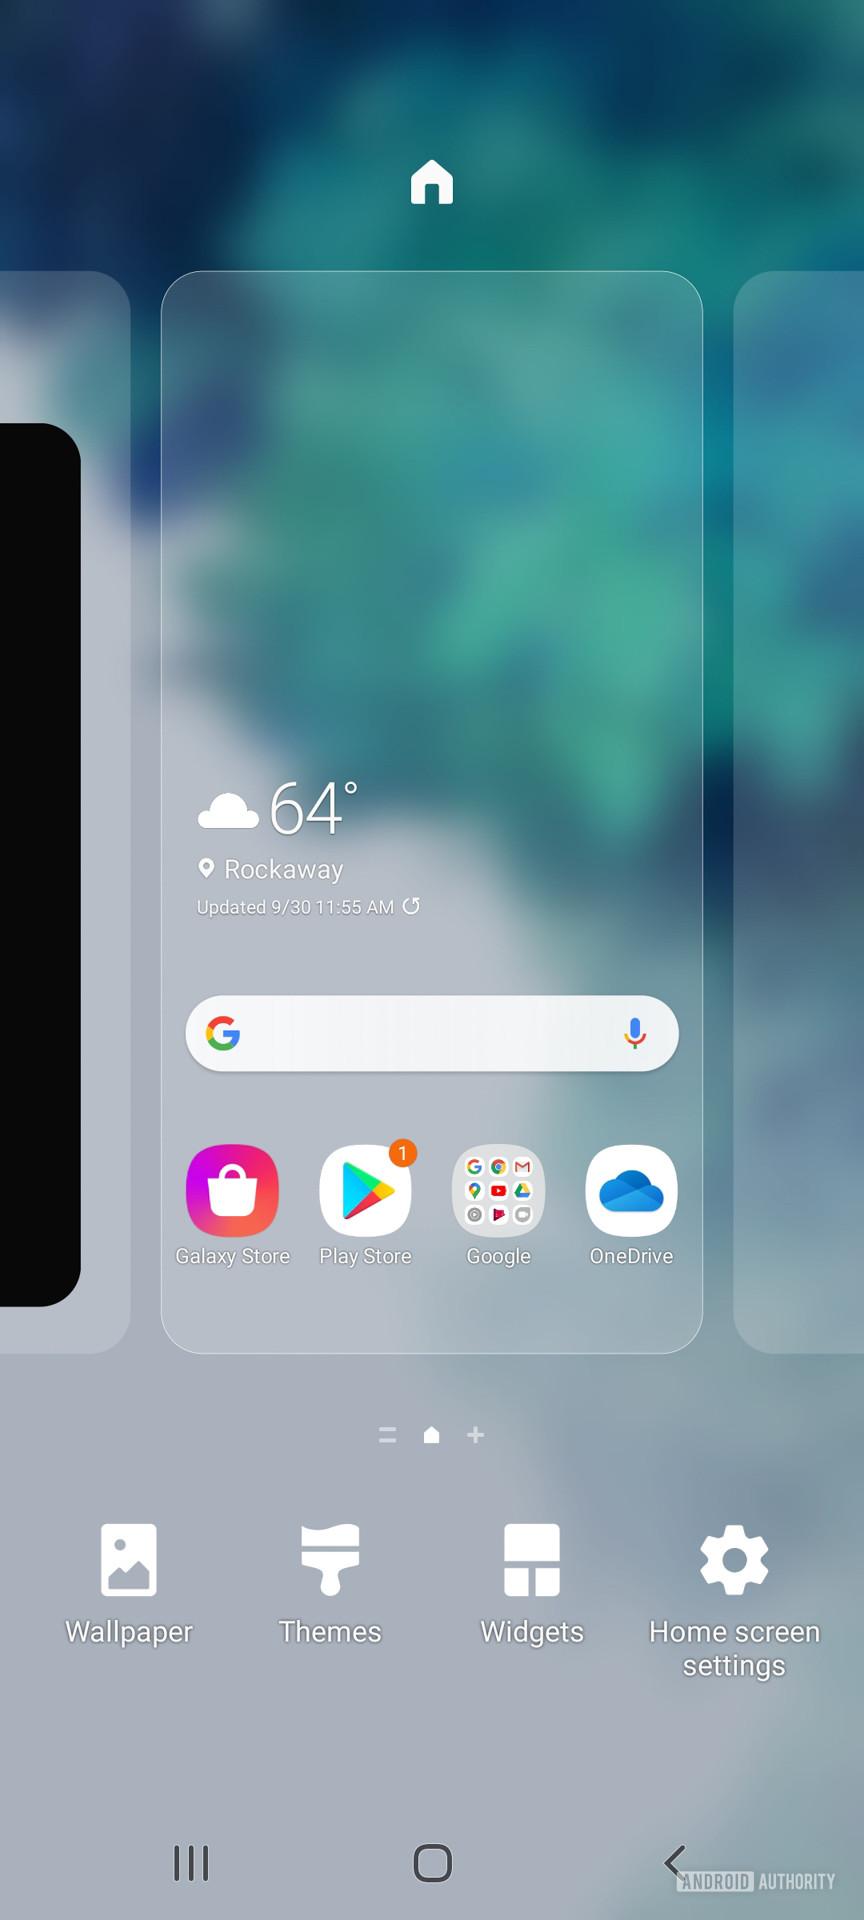 Samsung Galaxy S20 FE twaking home screens